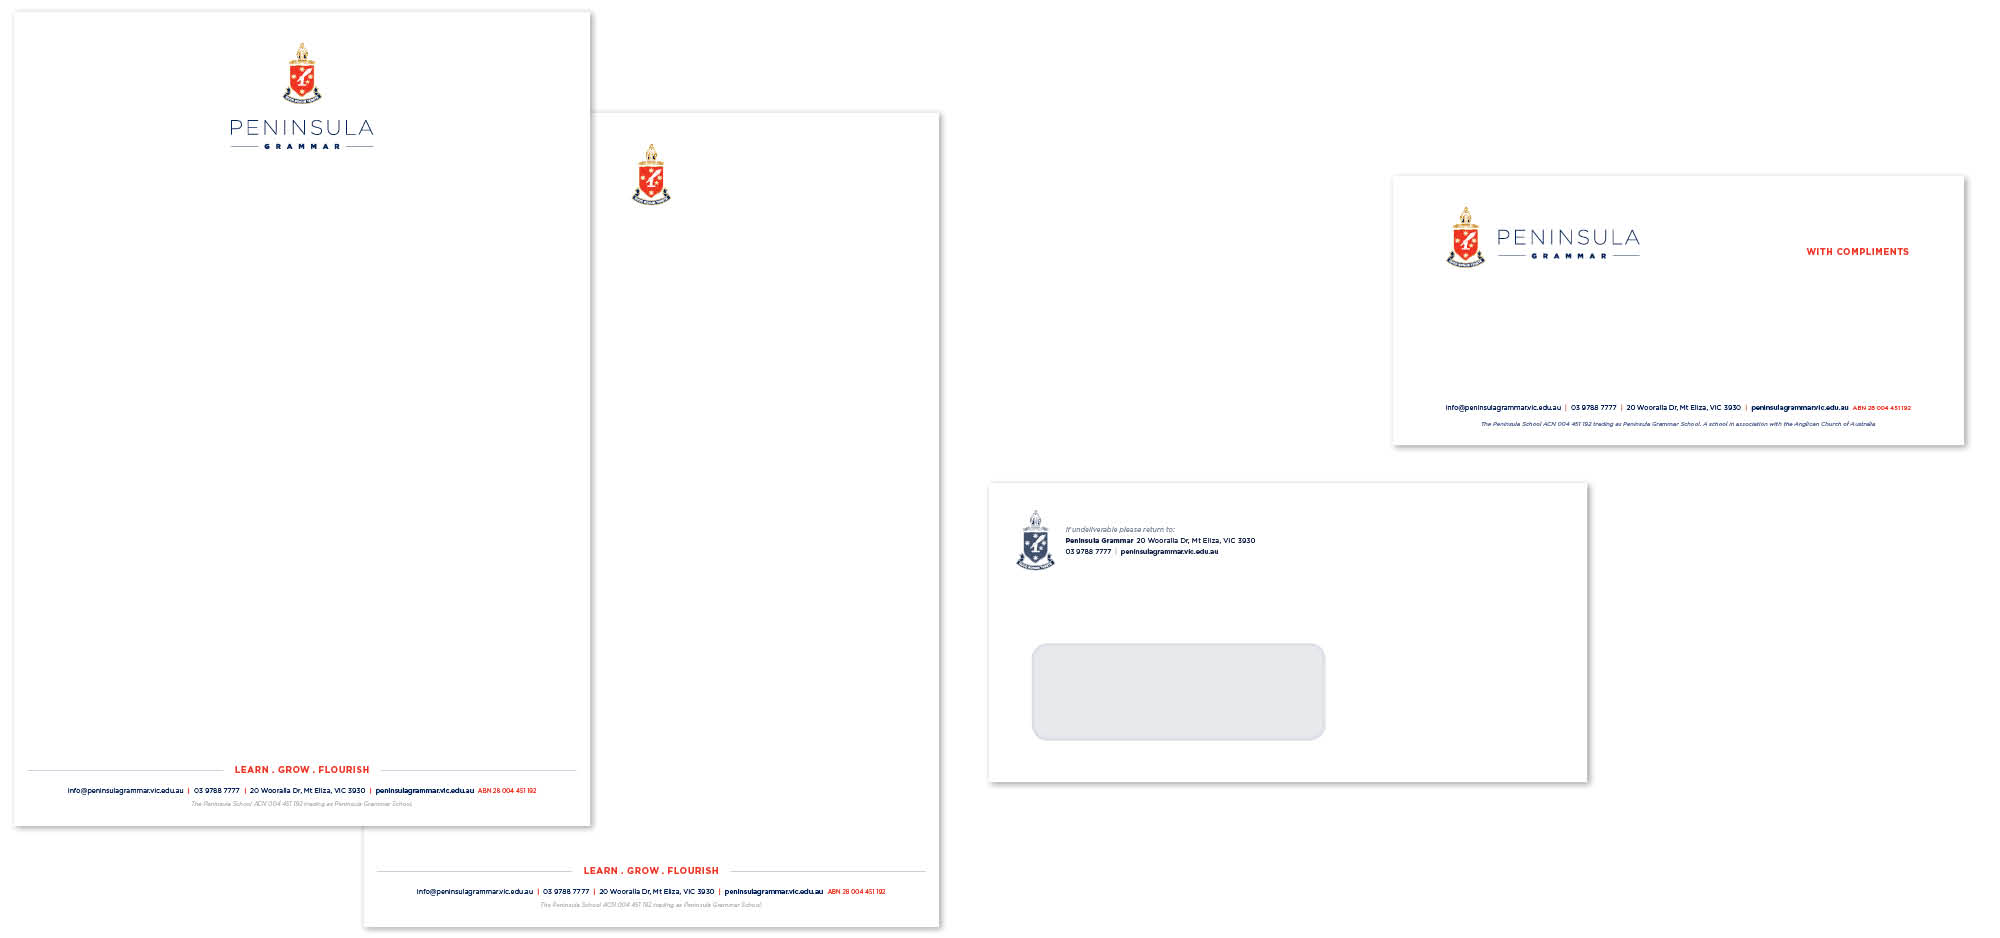 Letterhead design for Peninsula Grammar